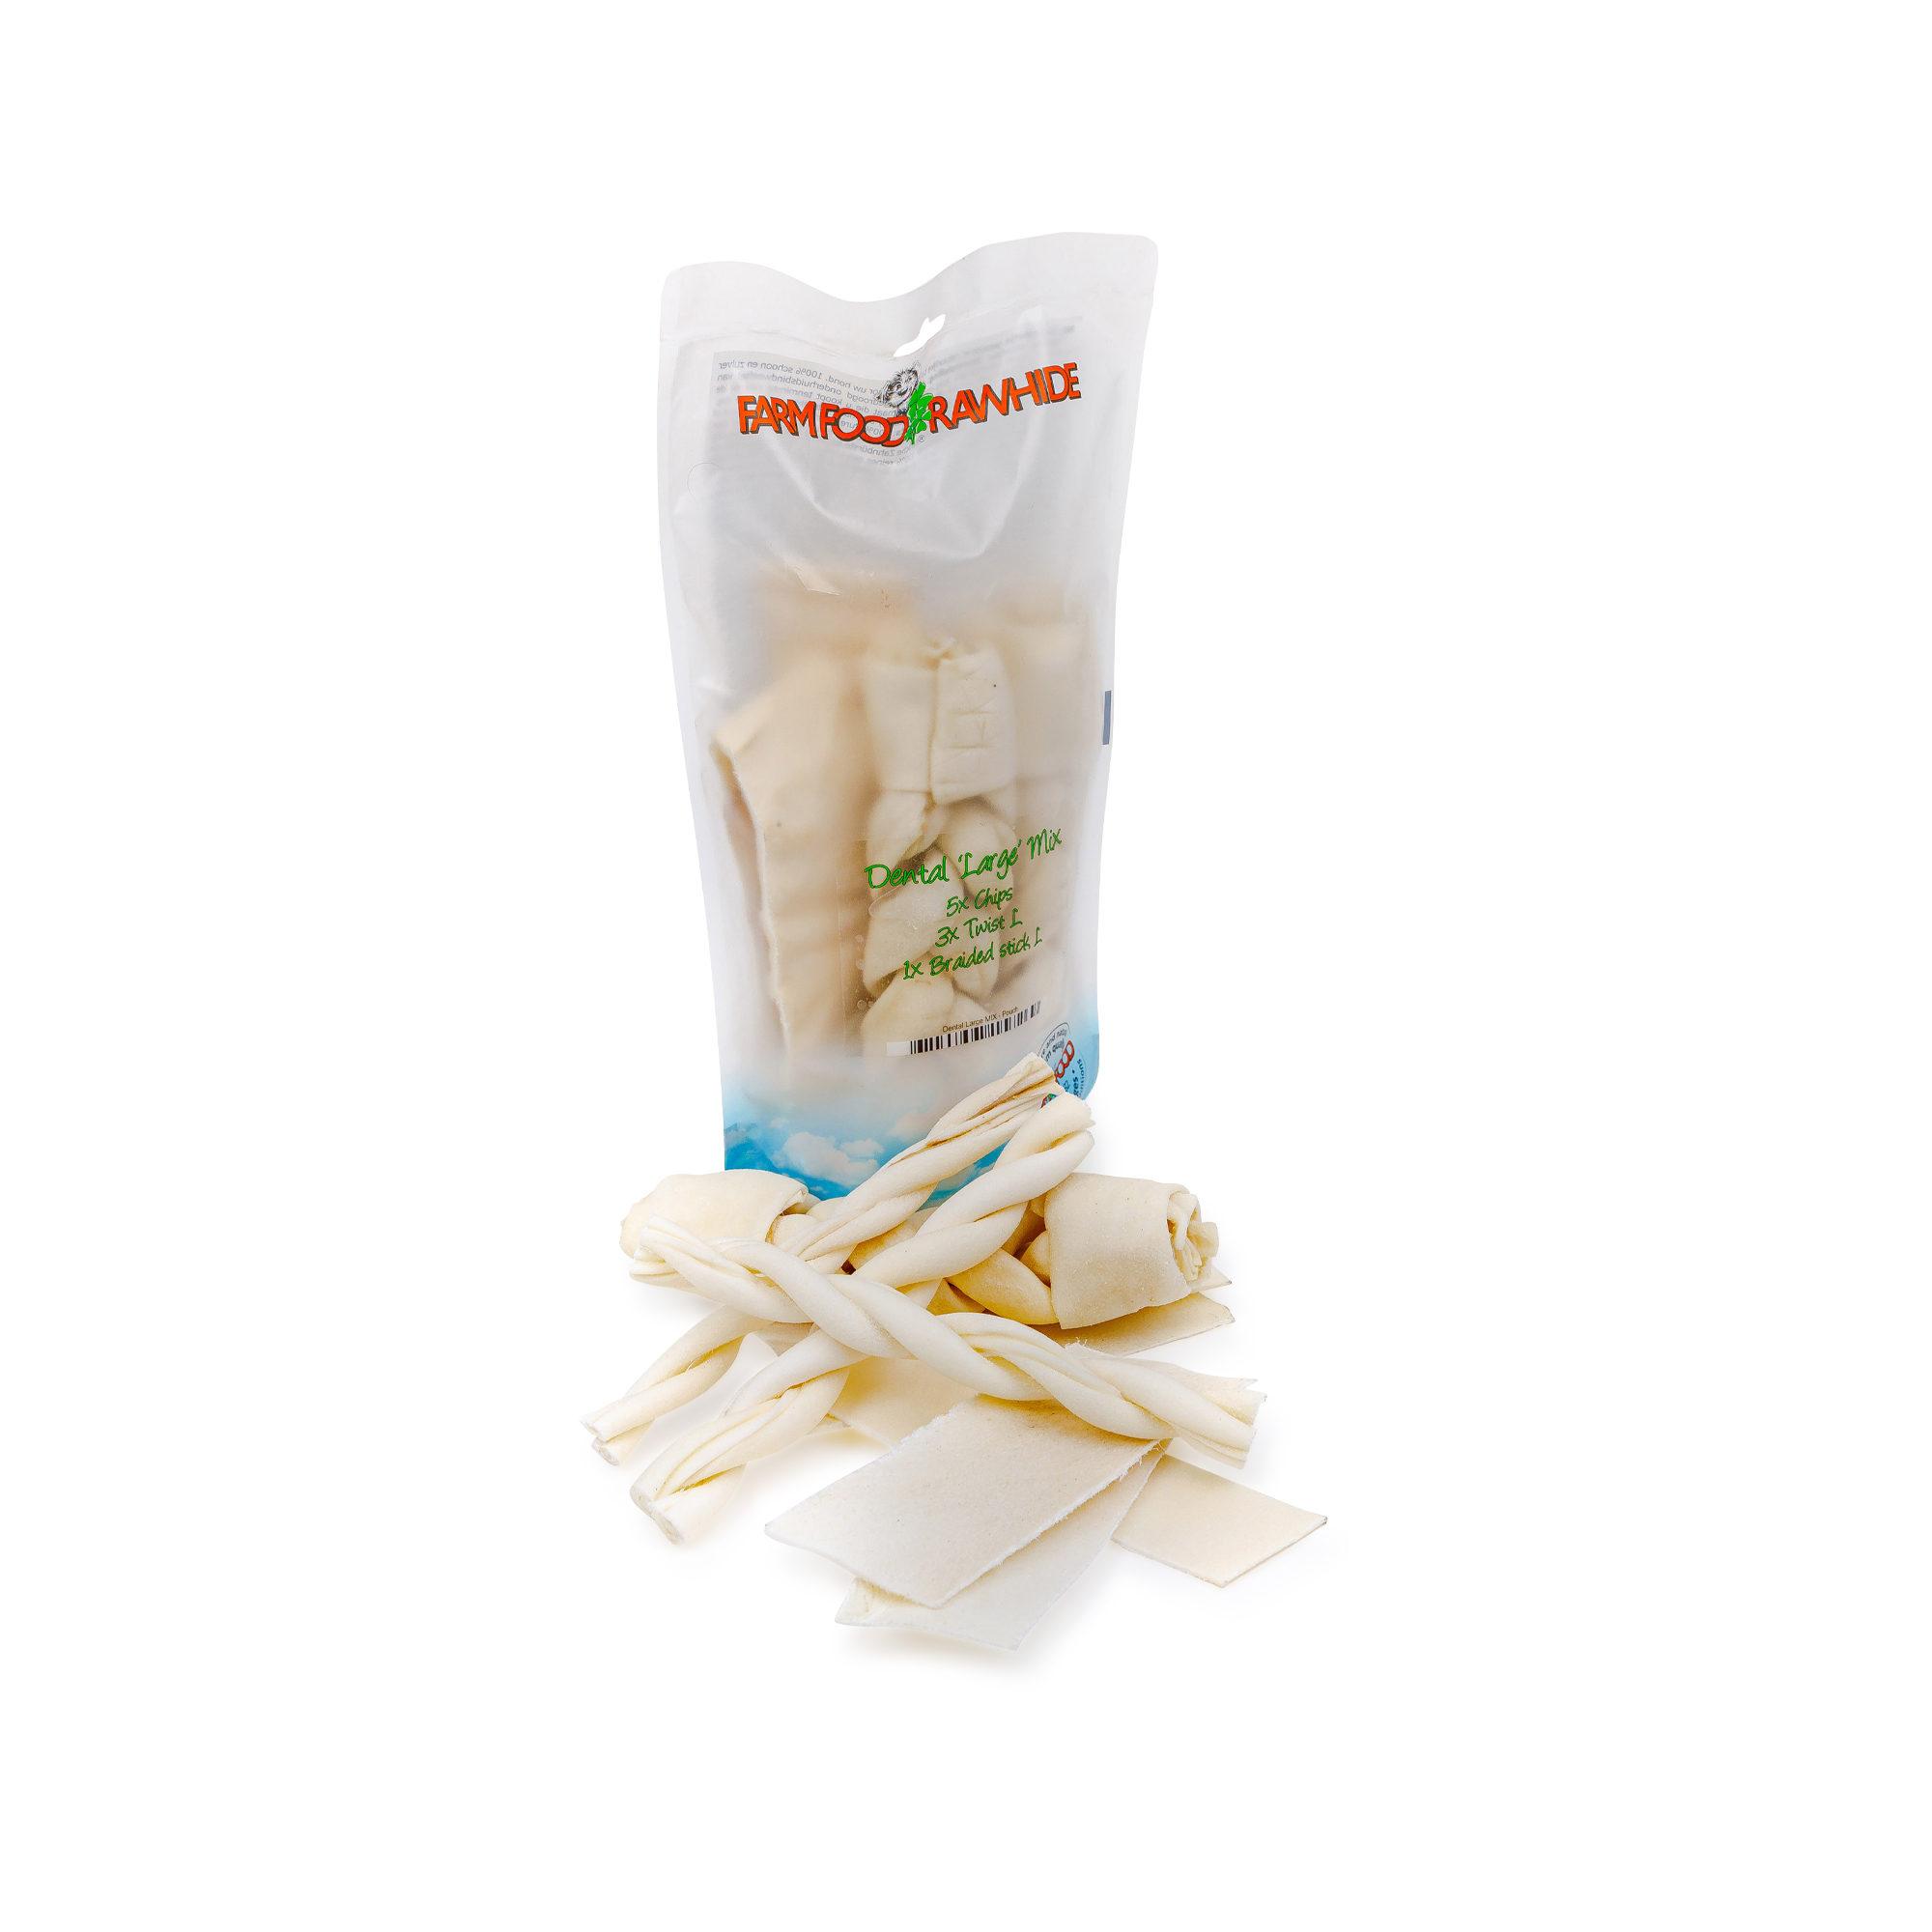 Farm Food Rawhide Dental Large Mix